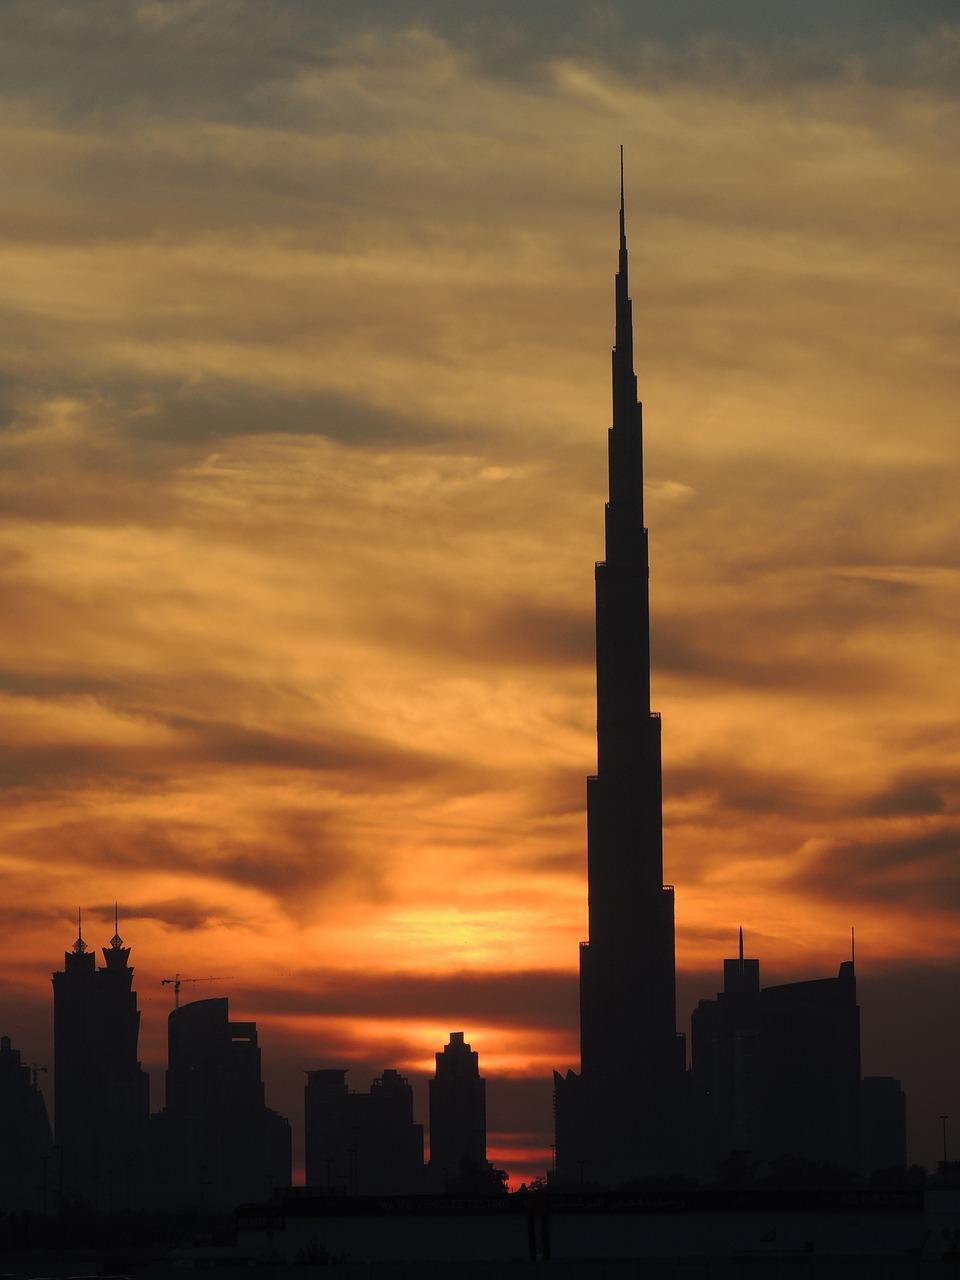 Burj Khalifa (Tallest structure in the world)